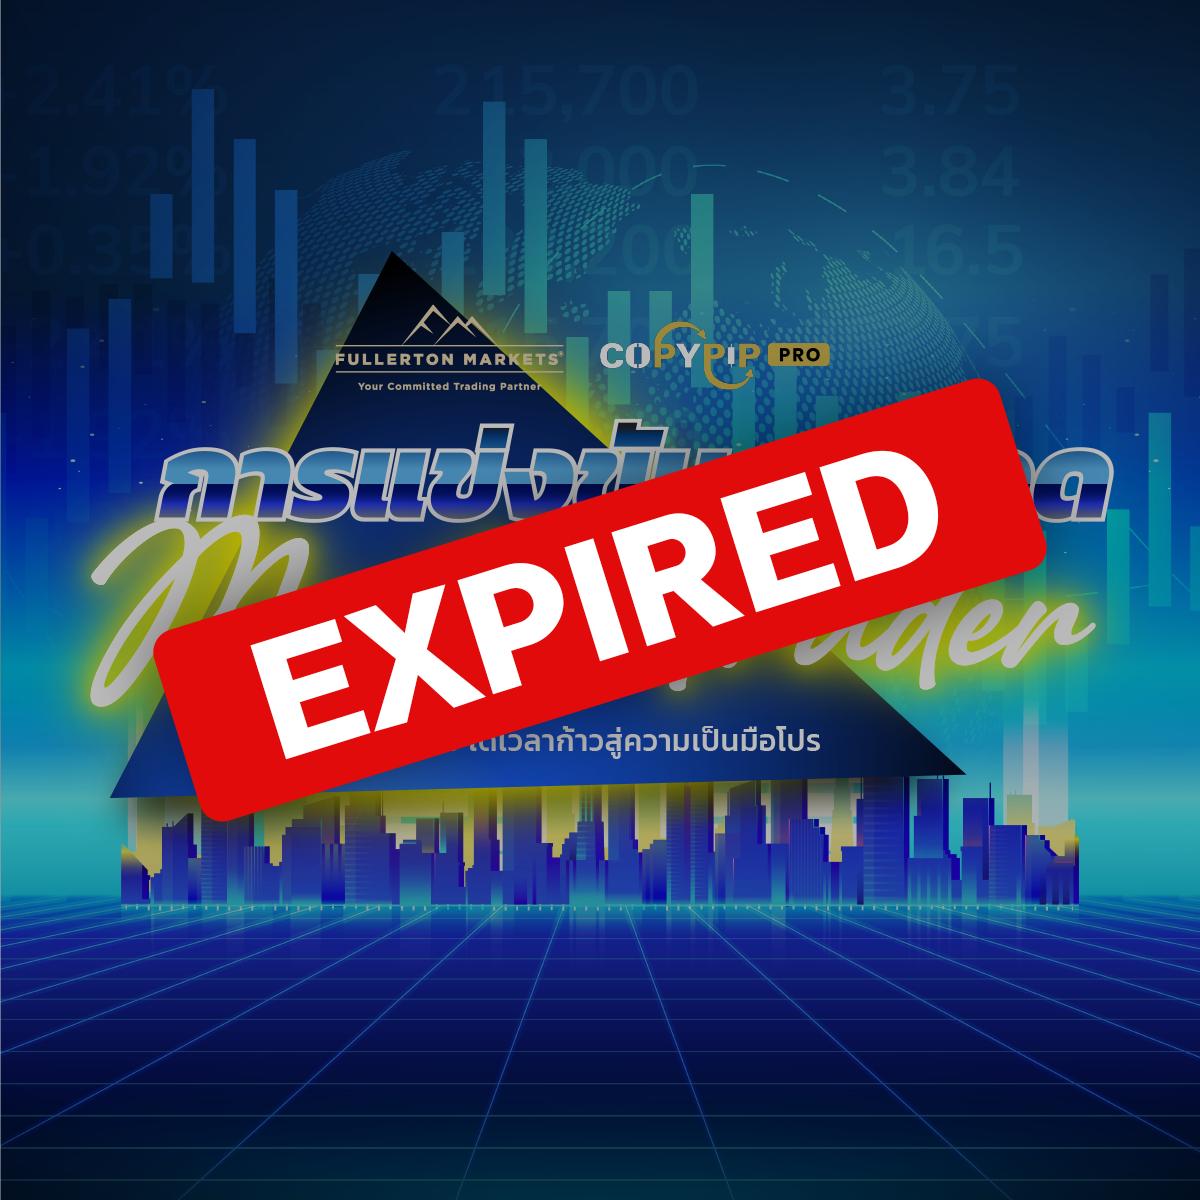 CopyPip-Pro-Trading-Contest_1200x1200px_th